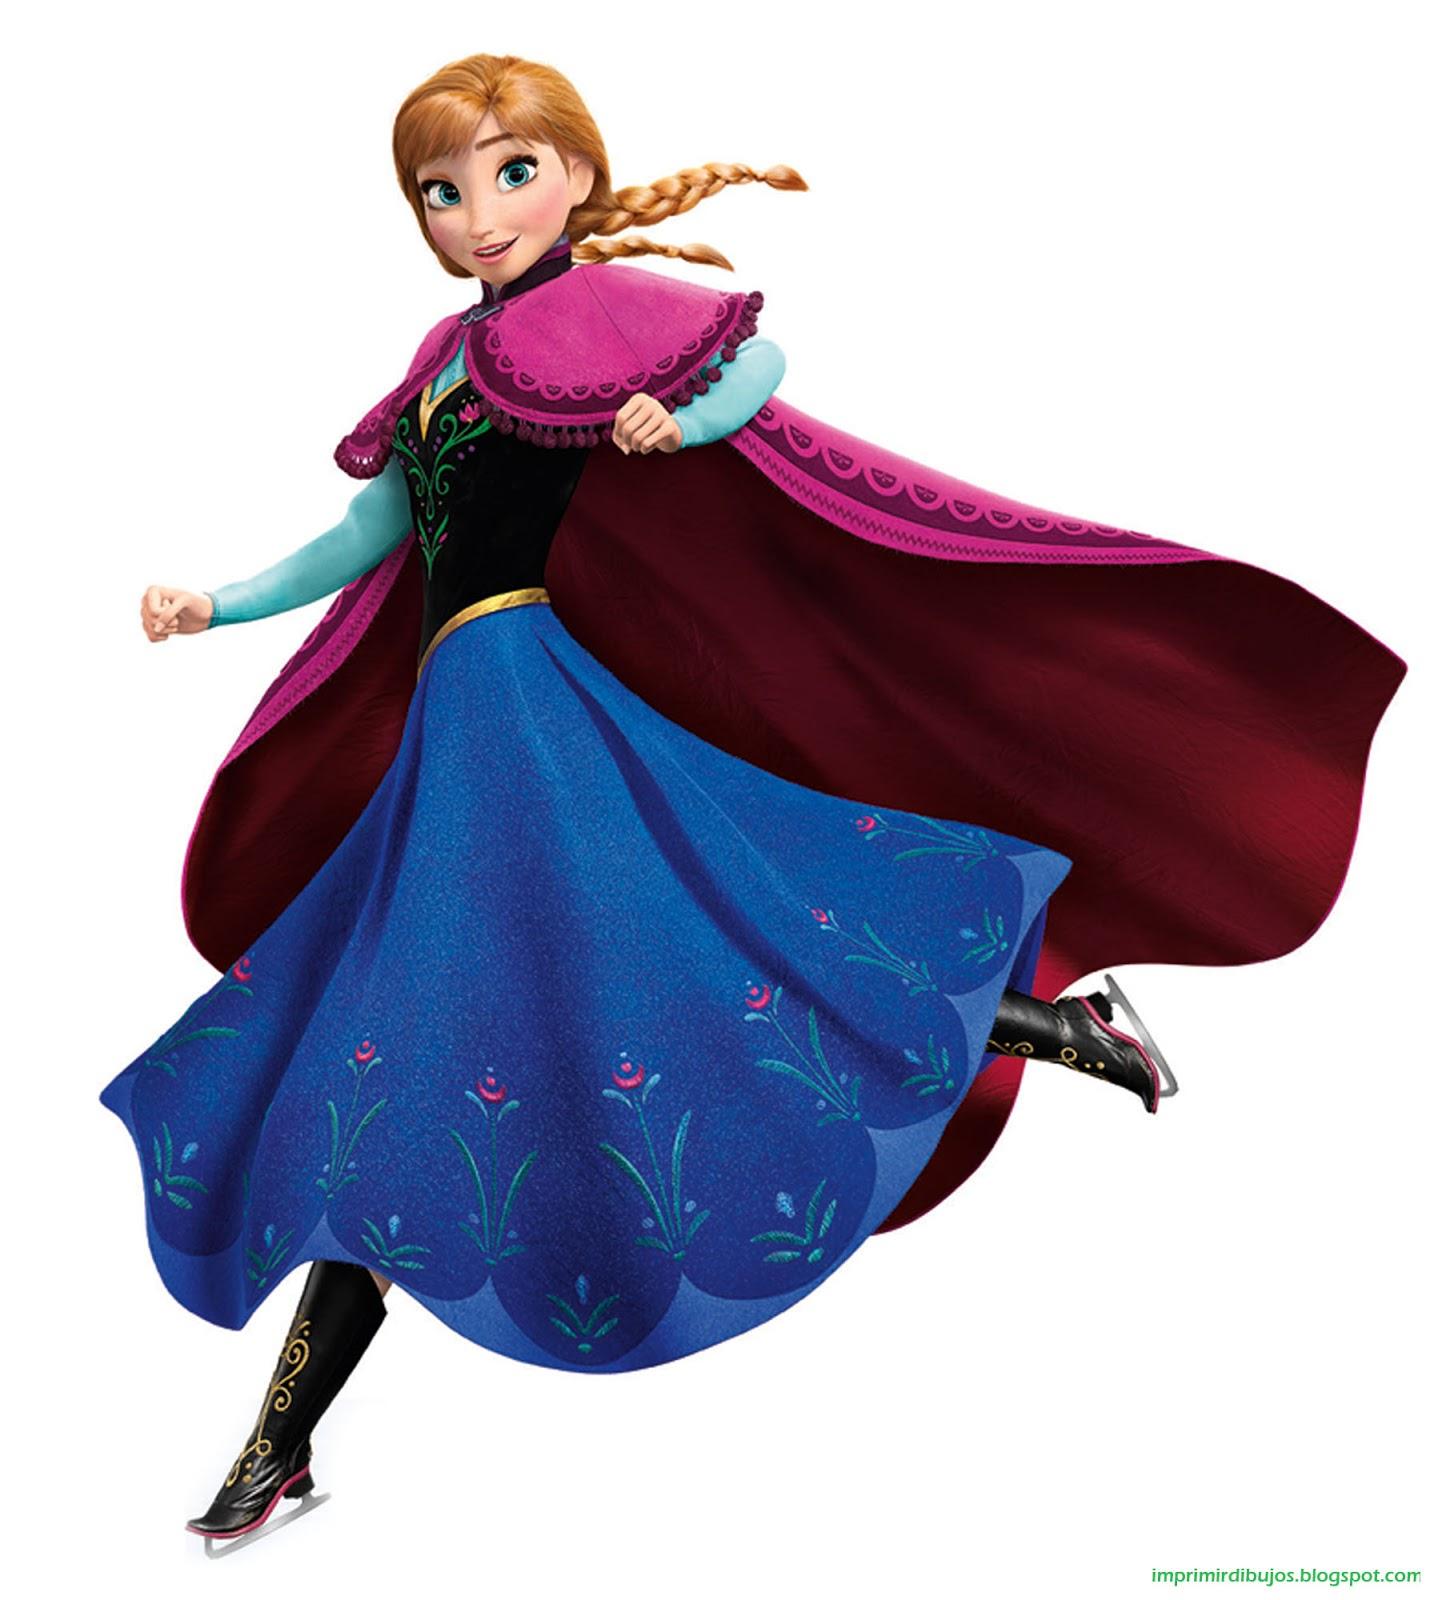 Imprimir Dibujos: Personajes de Frozen - El Reino del ...